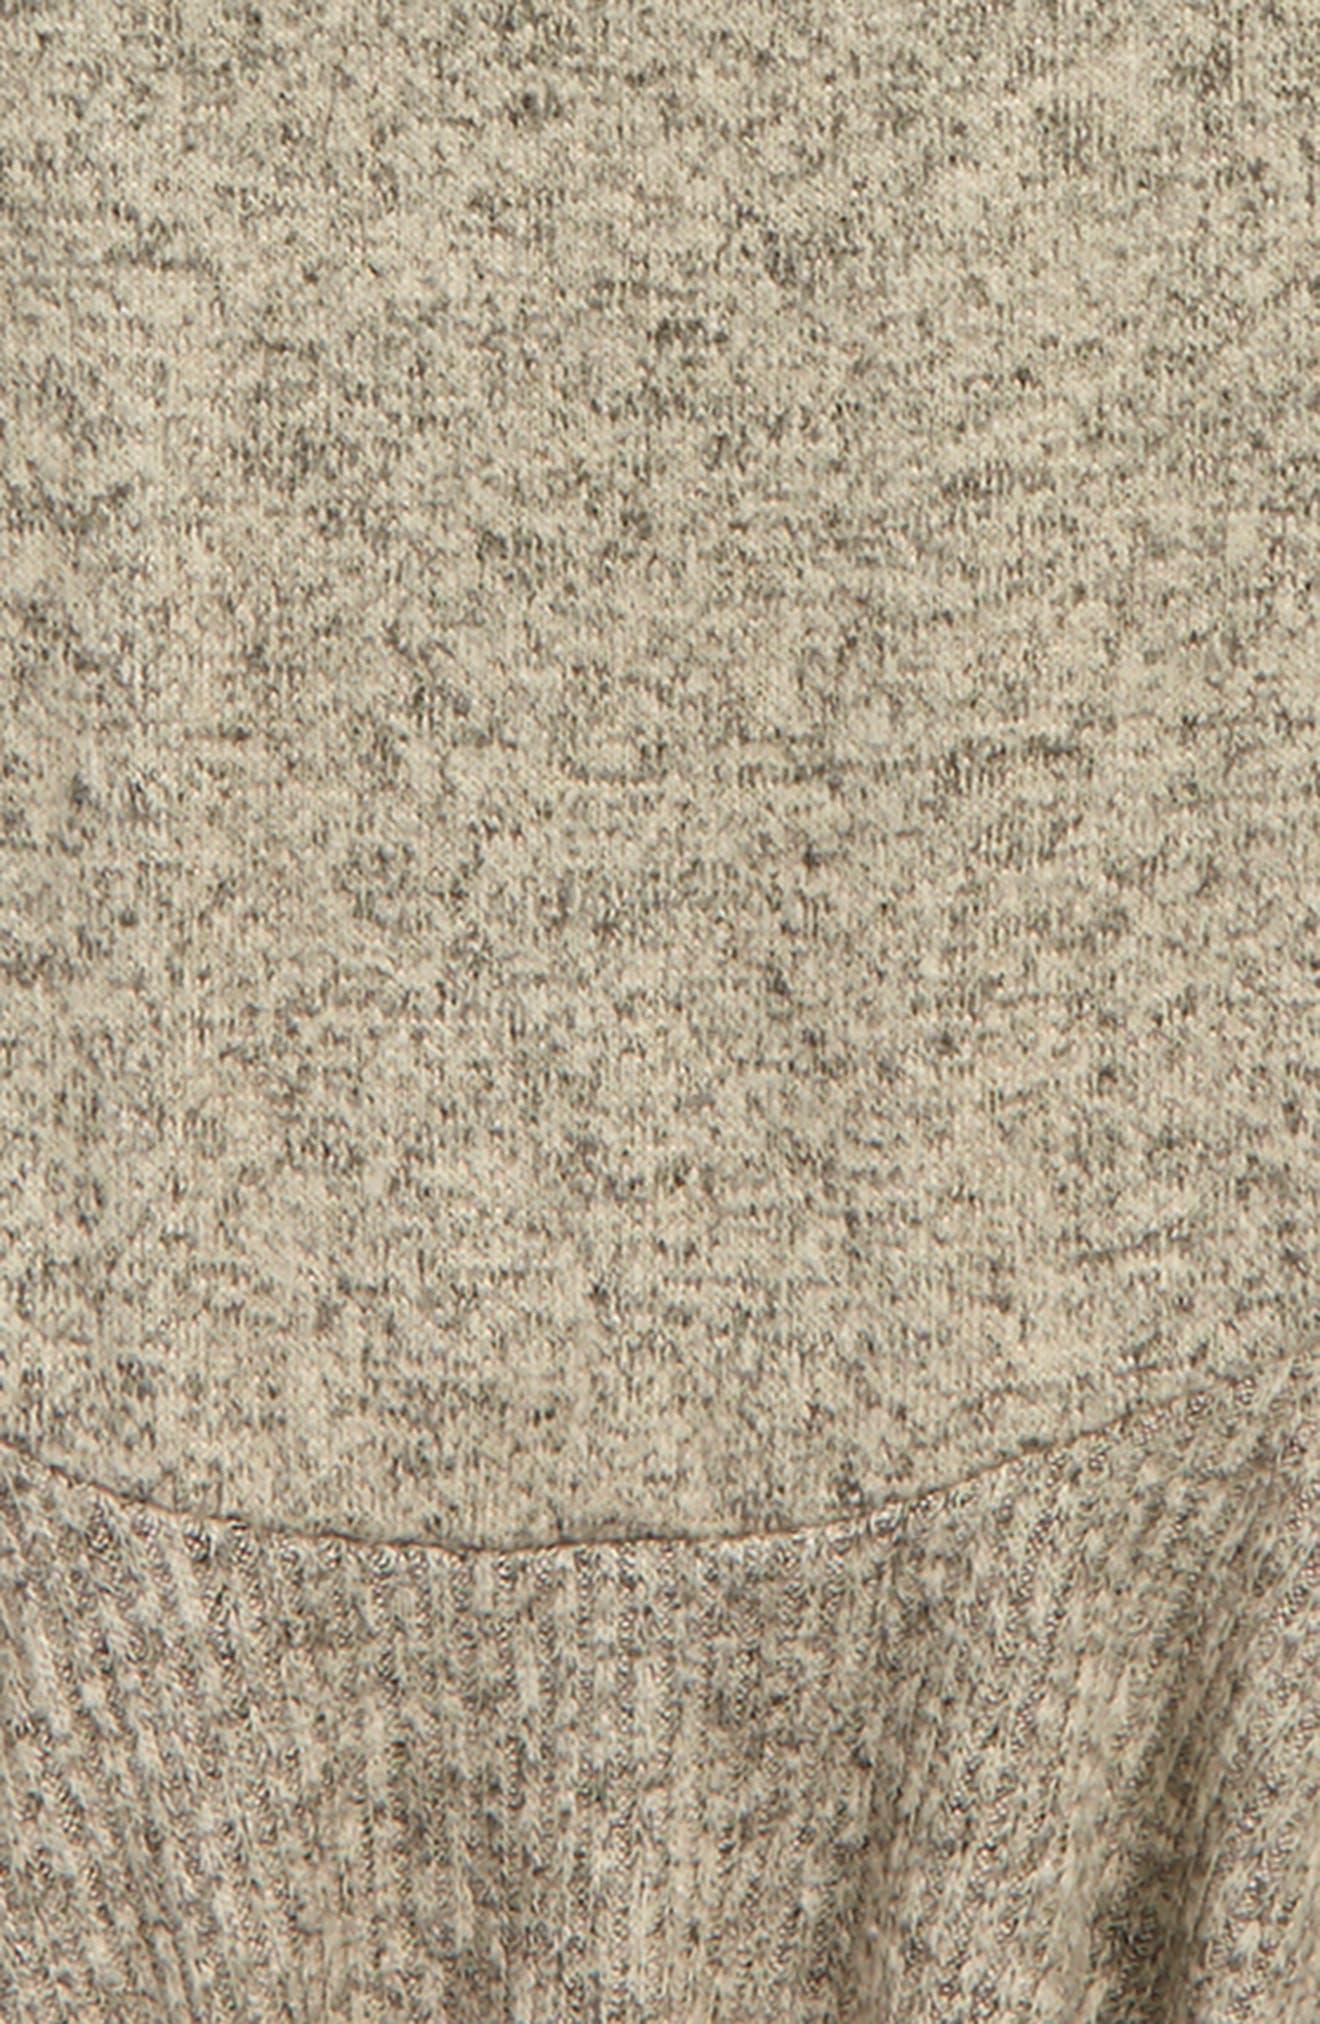 Fleece Peplum Top,                             Alternate thumbnail 2, color,                             Taupe